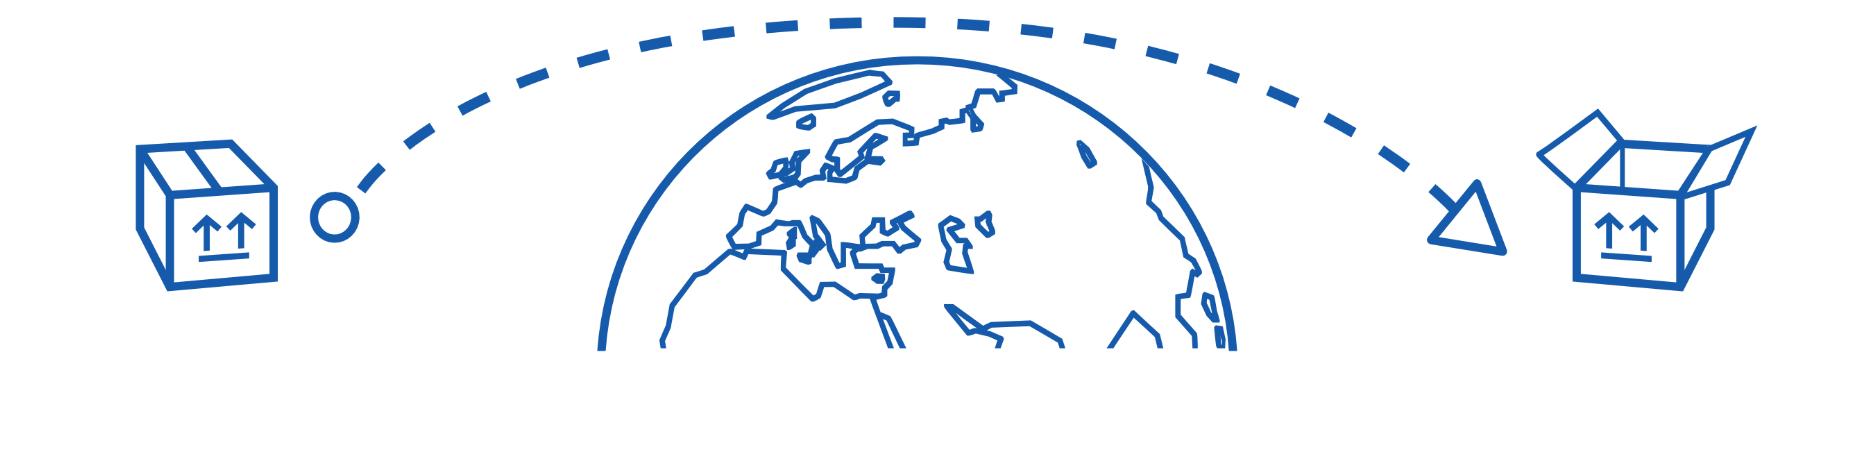 Maximize the Upside of Cross-Border E-Commerce and Minimize the Risk